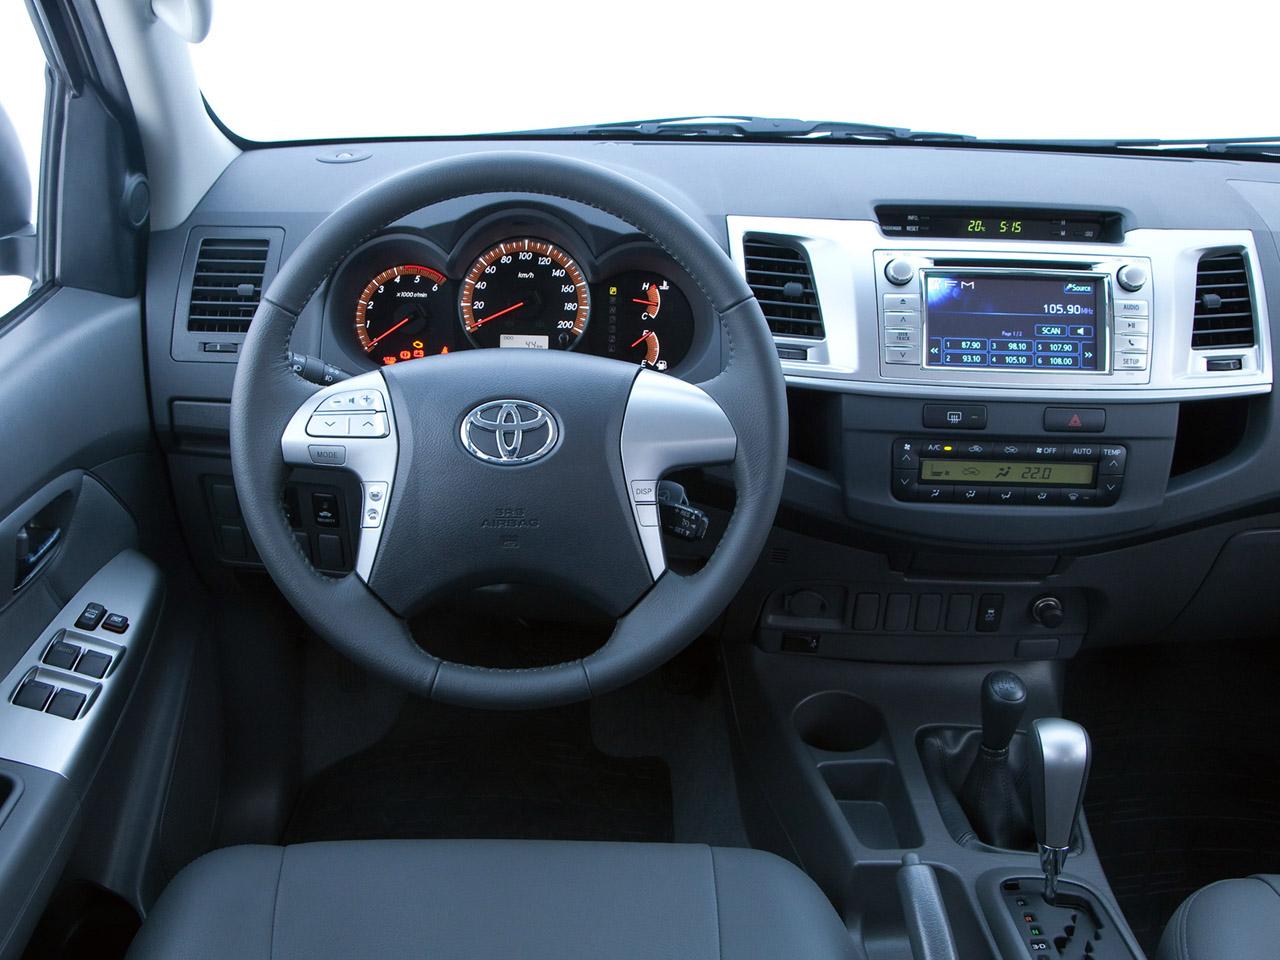 Nova Hilux Preta >> Toyota Hilux SRV Double Cab 4×4 2012 Toyota Hilux SRV Double Cab 4x4 2012 Photo 01 – Car in ...